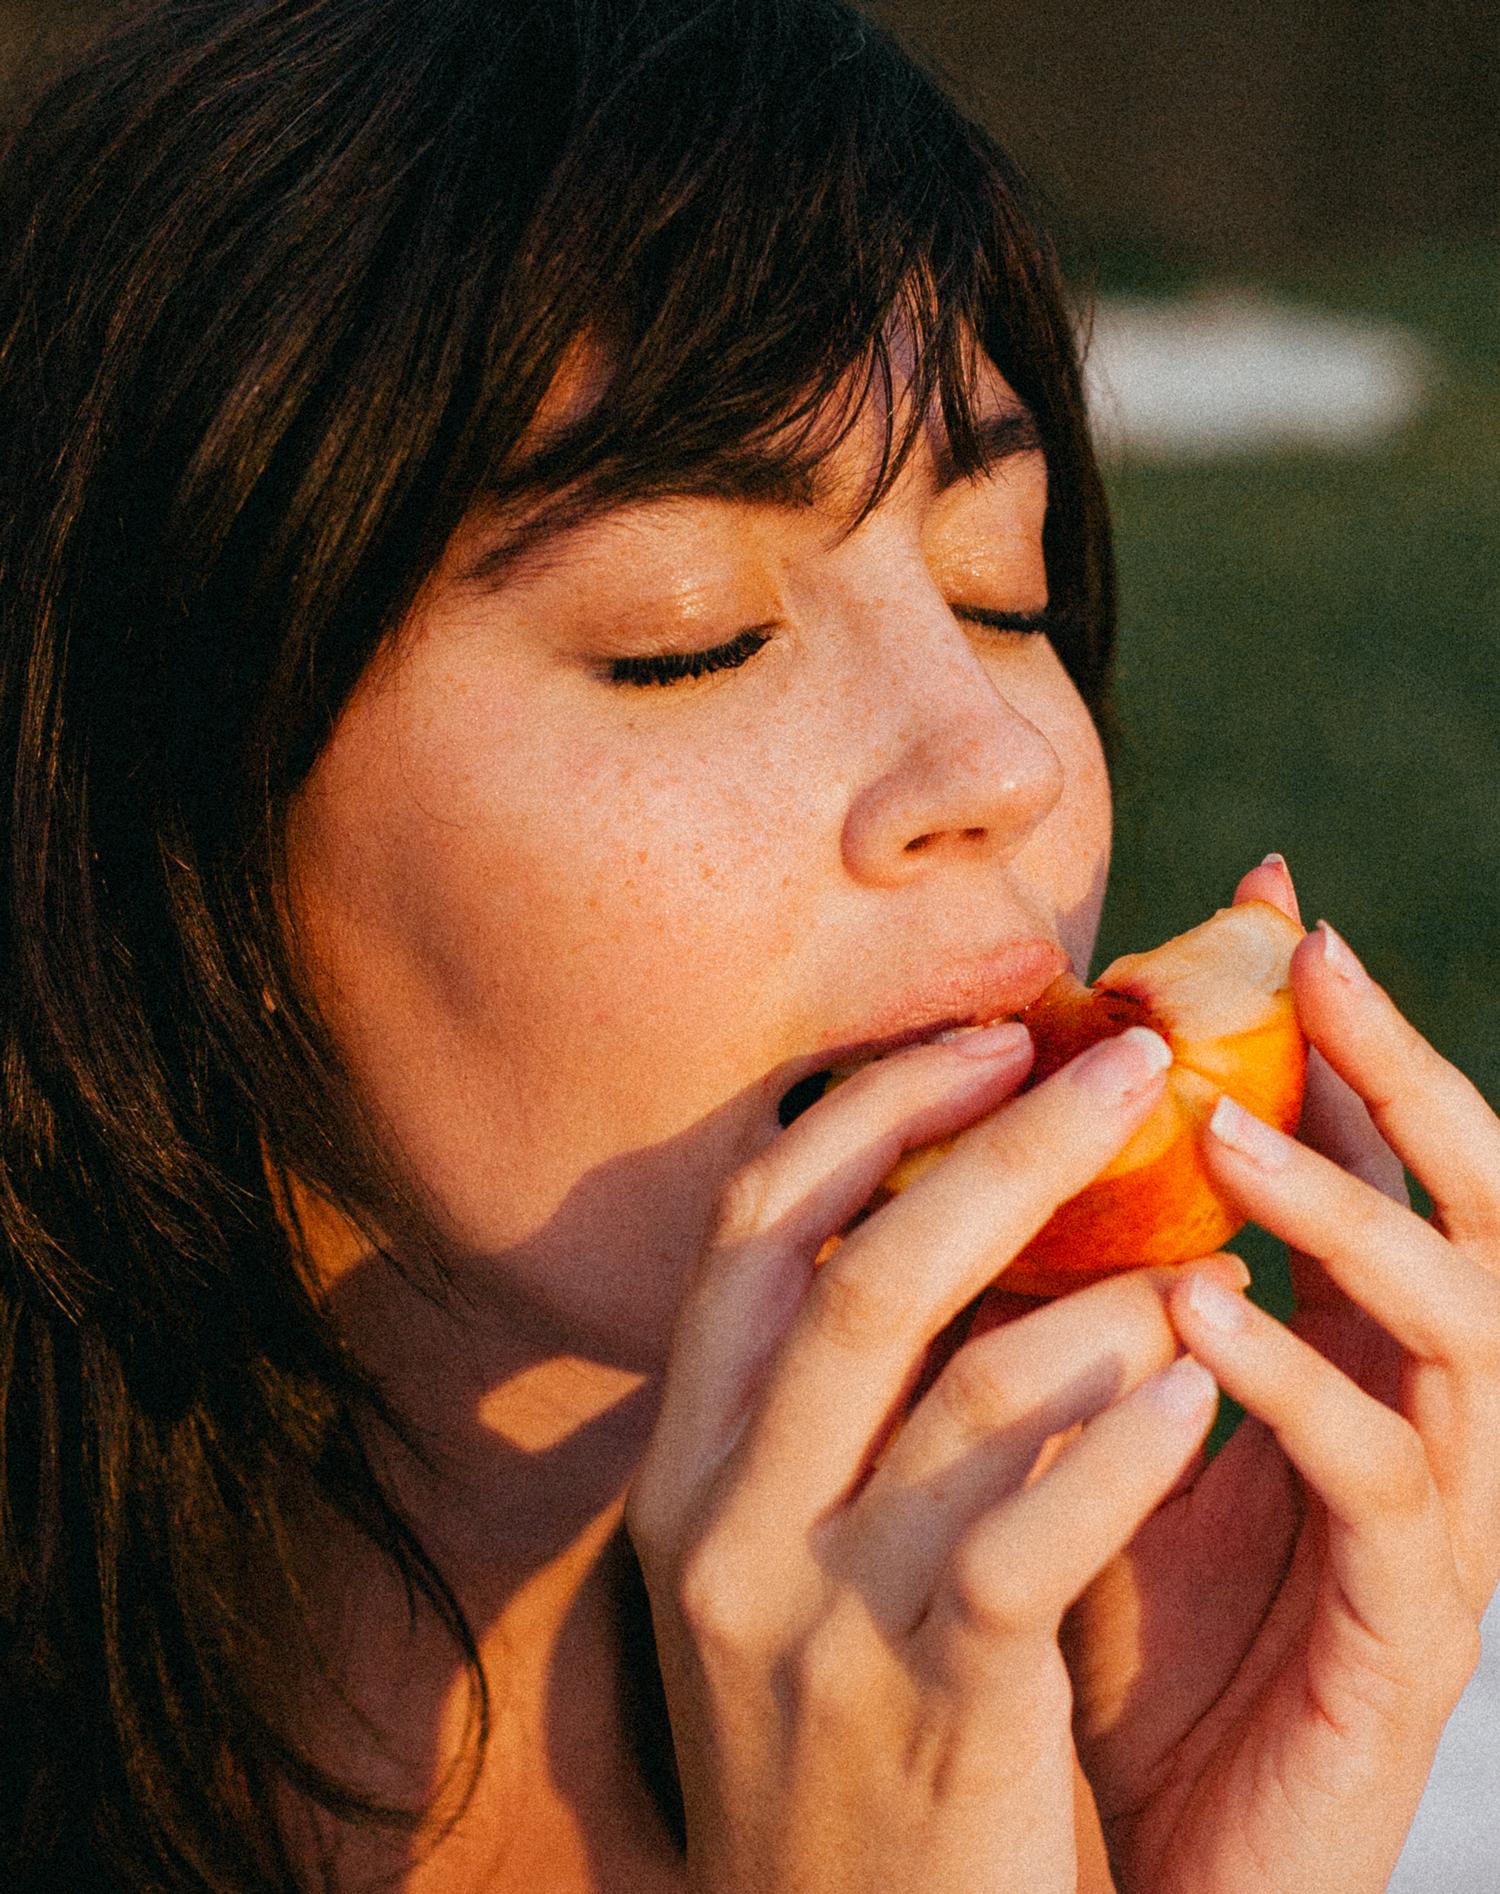 closeup of girl eating peach